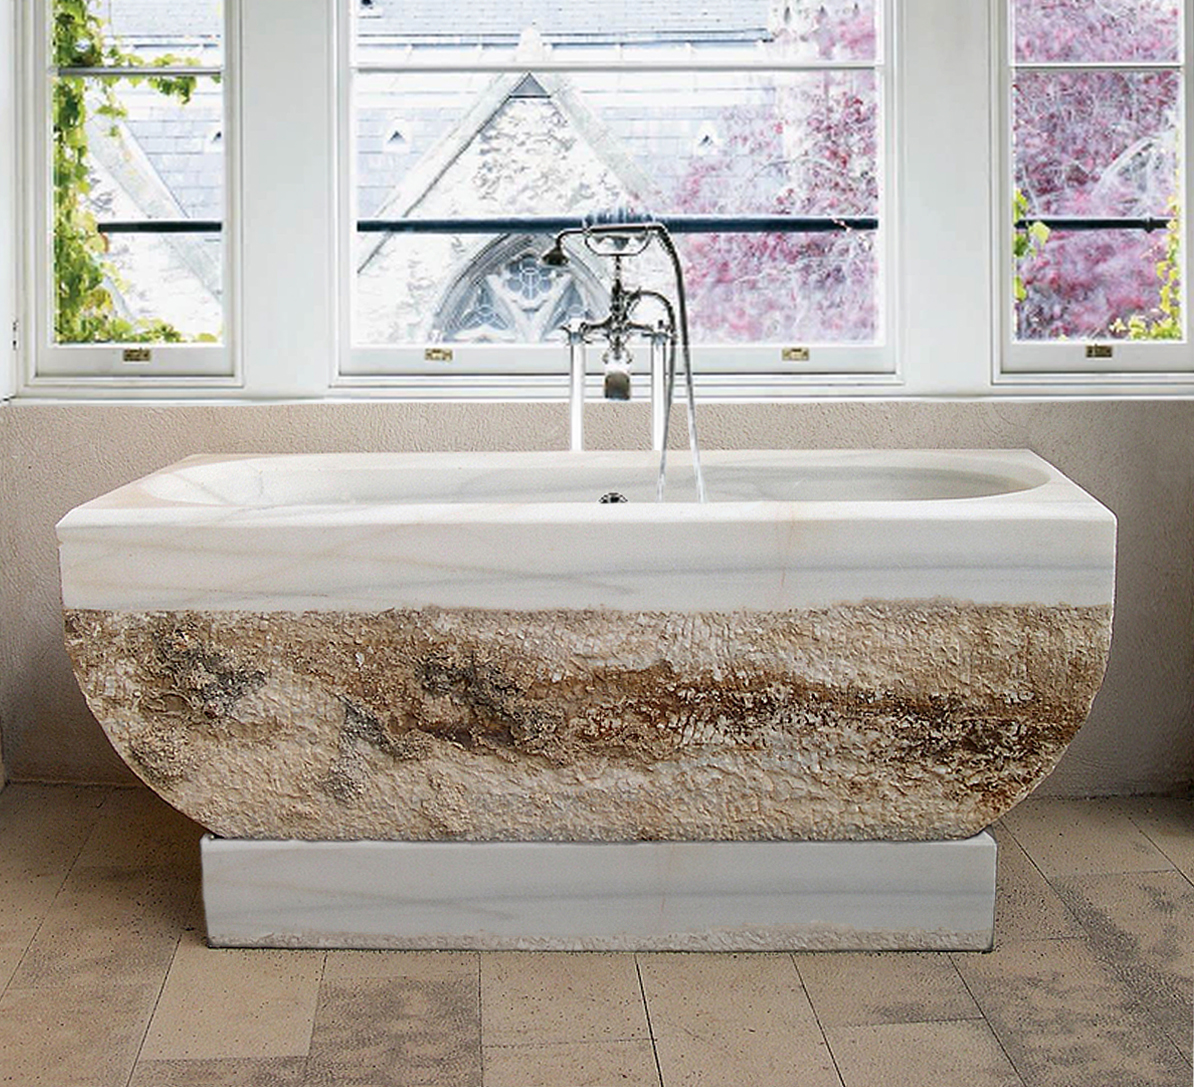 stone black bm products purescape surface web aquatica graphite bathtubs solid freestanding bathtub